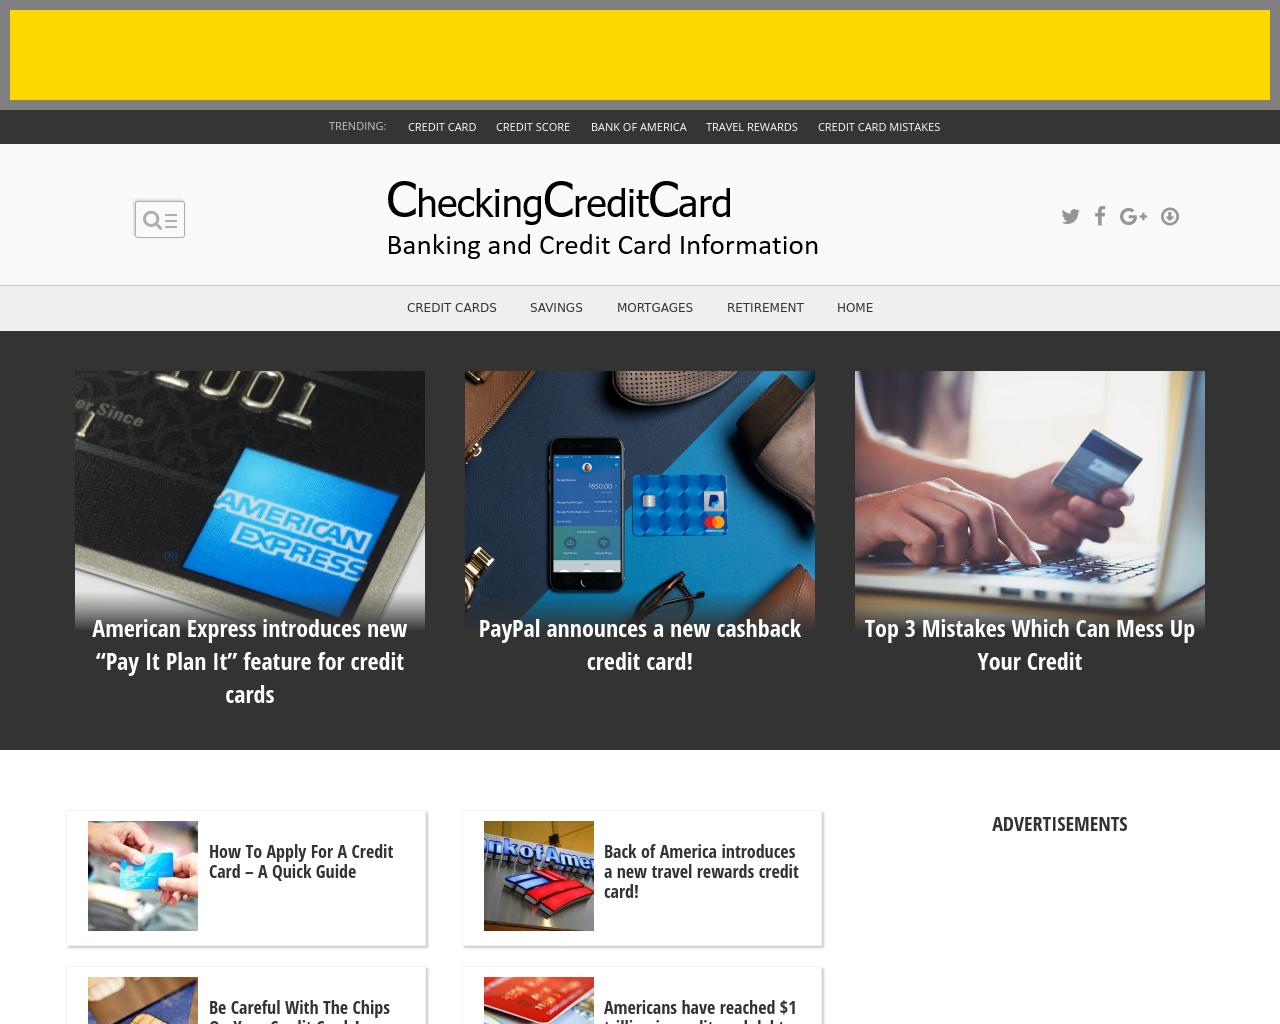 CheckingCreditCard.com-Advertising-Reviews-Pricing